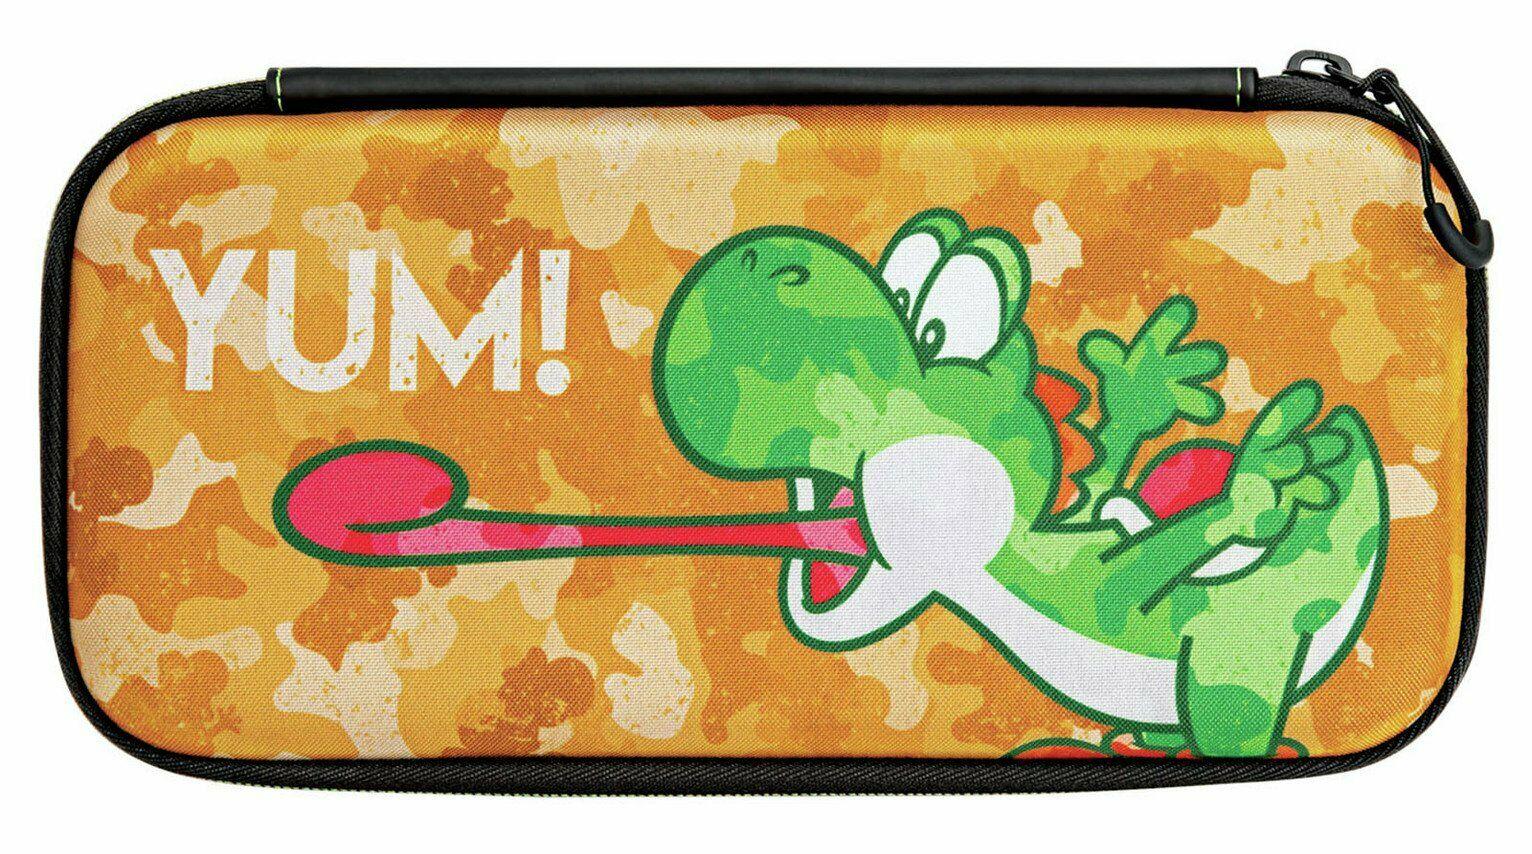 Nintendo Switch Slim Travel Case - Yoshi Camouflage £4.99 at Argos ebay